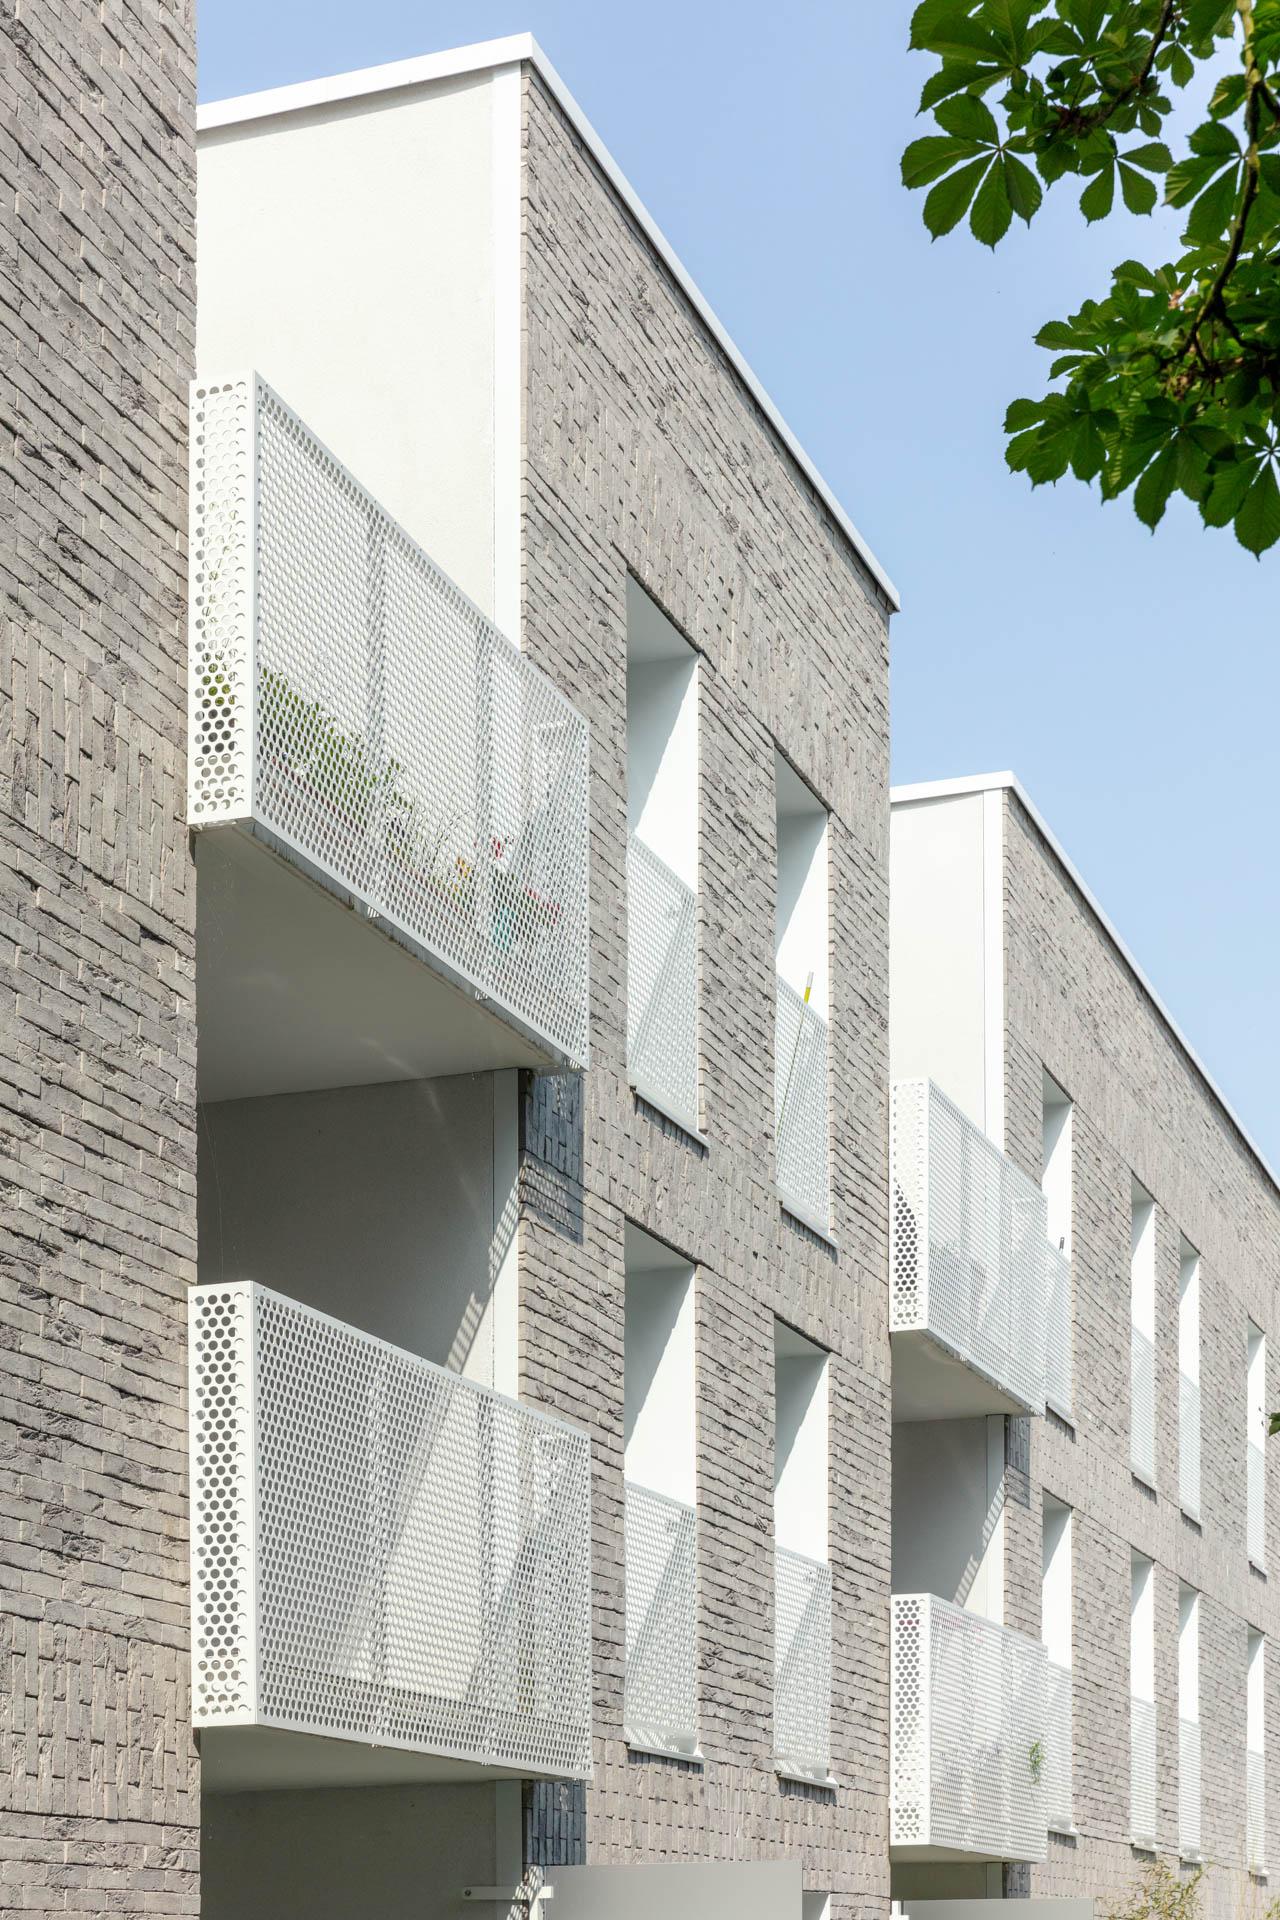 LDKphoto - Rue Henri Barbuse - Fache Thumesnil - 24.jpg